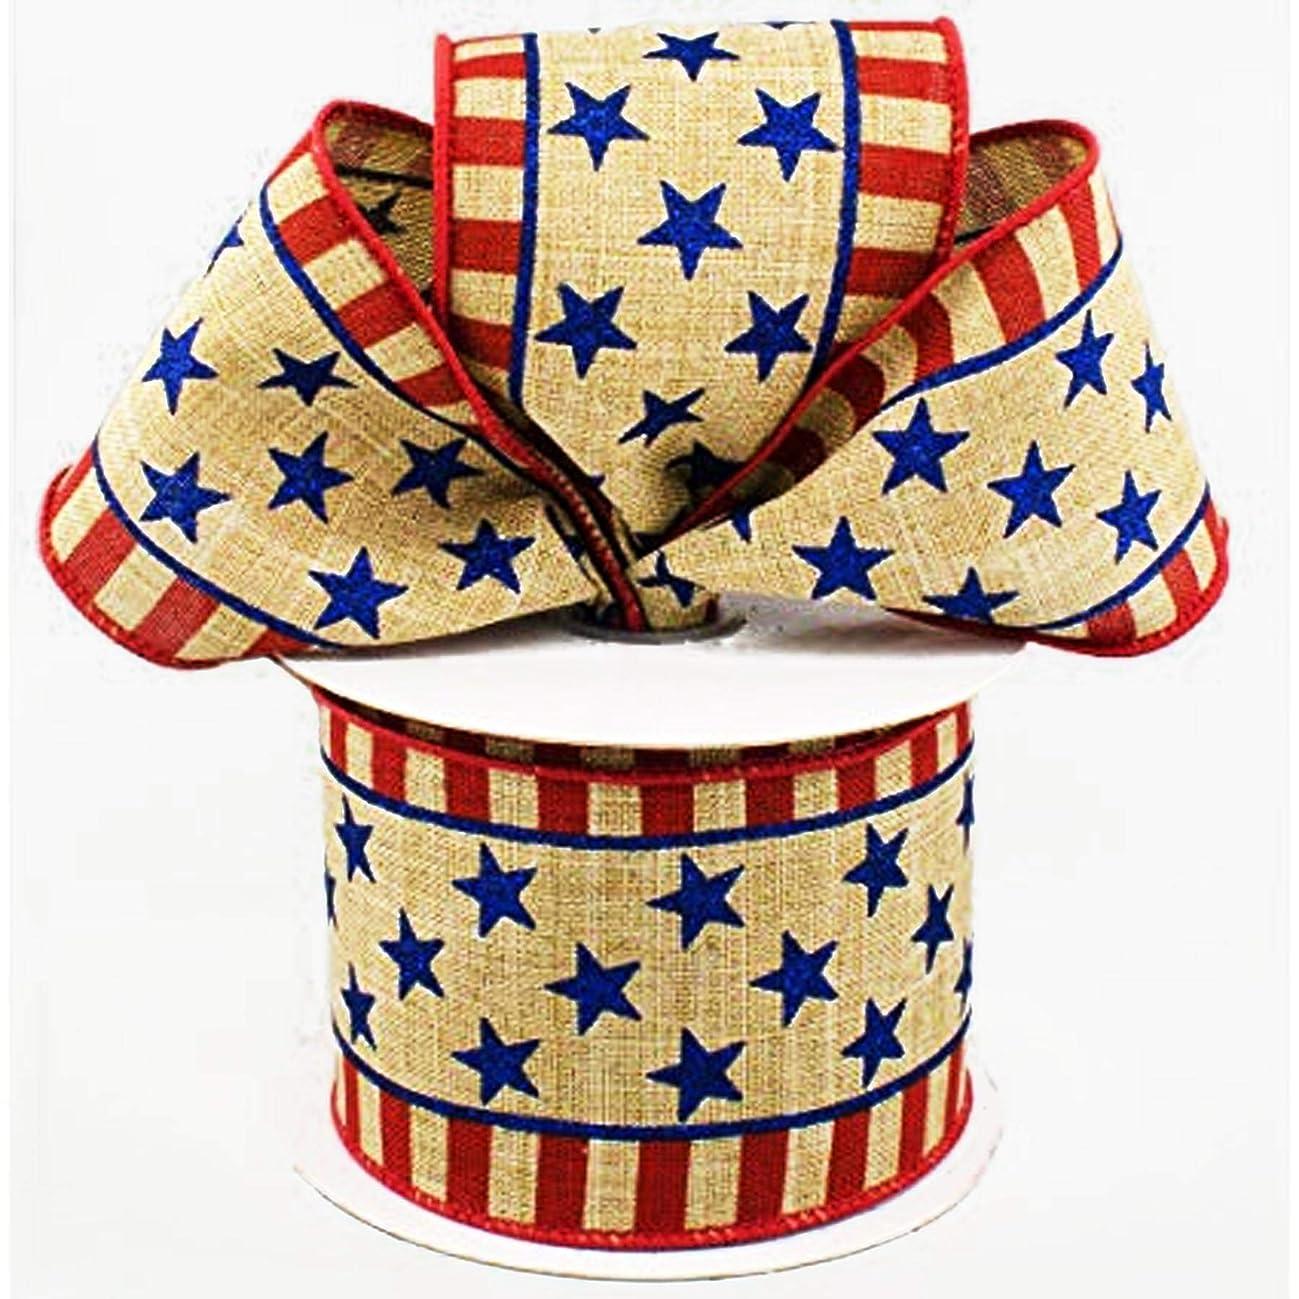 Patriotic Stars & Stripes Canvas Wired Edge Ribbon - 10 Yards (2.5